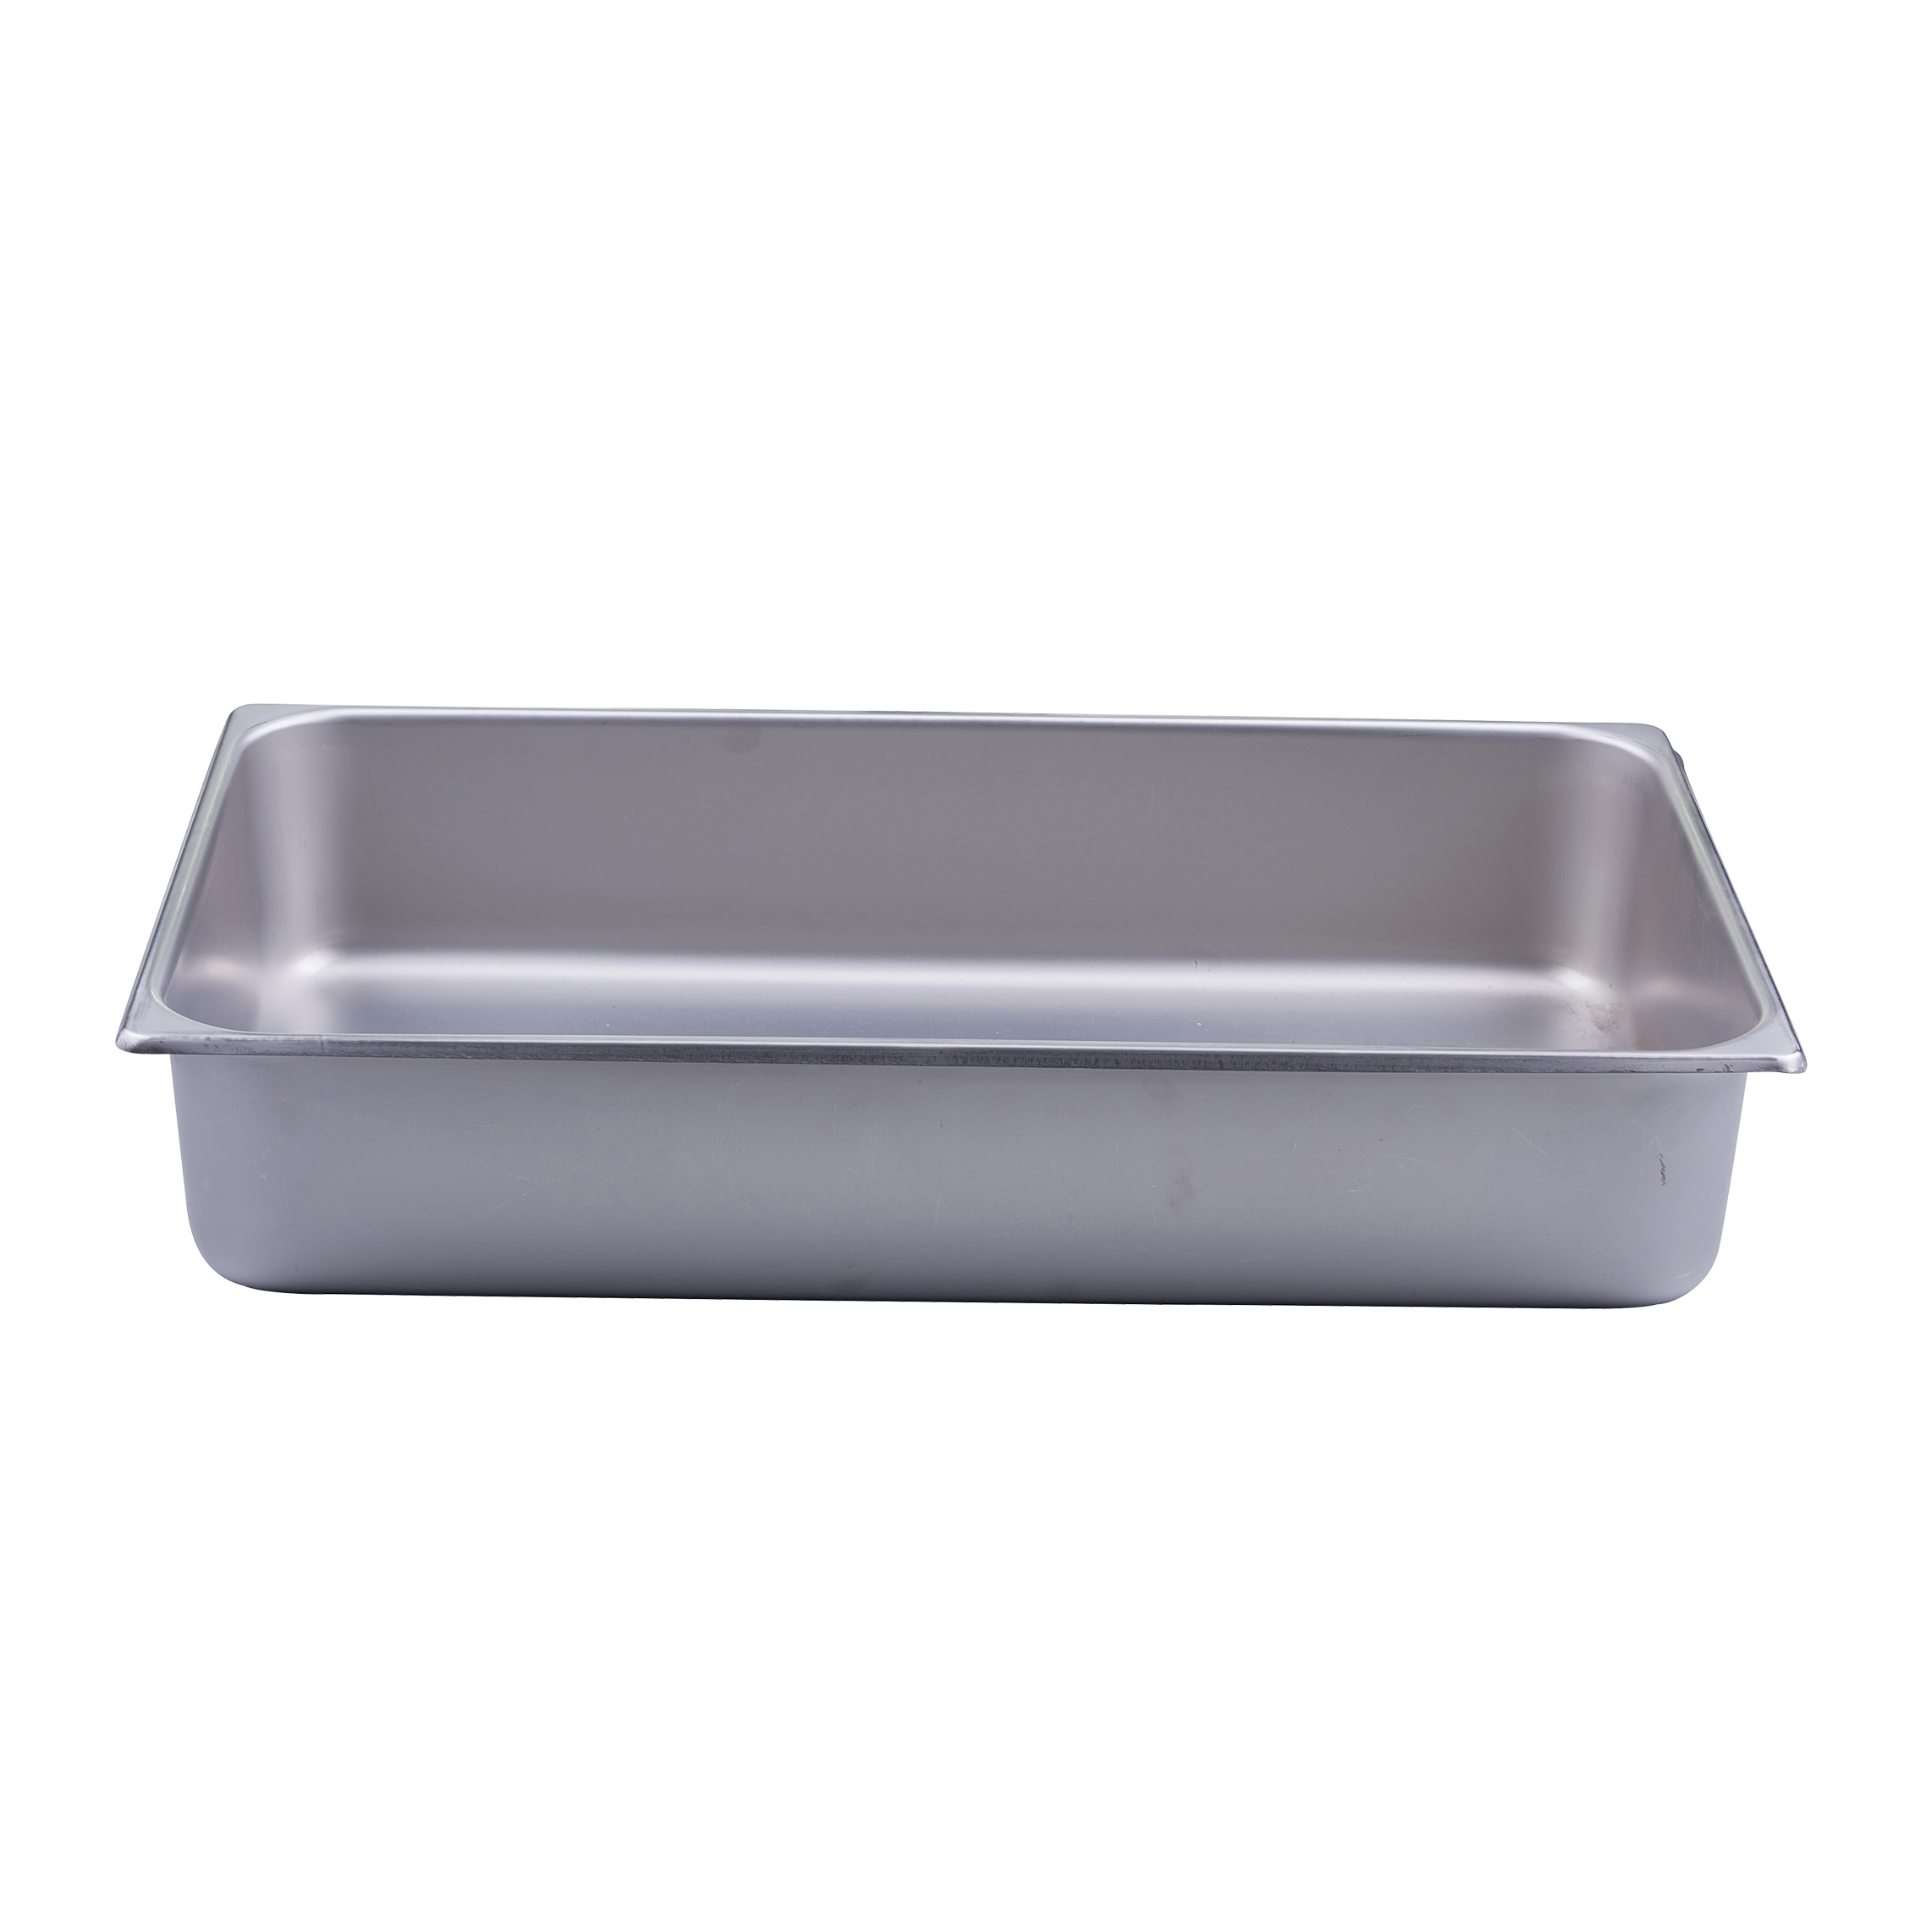 Winco 108A-WP chafing dish pan